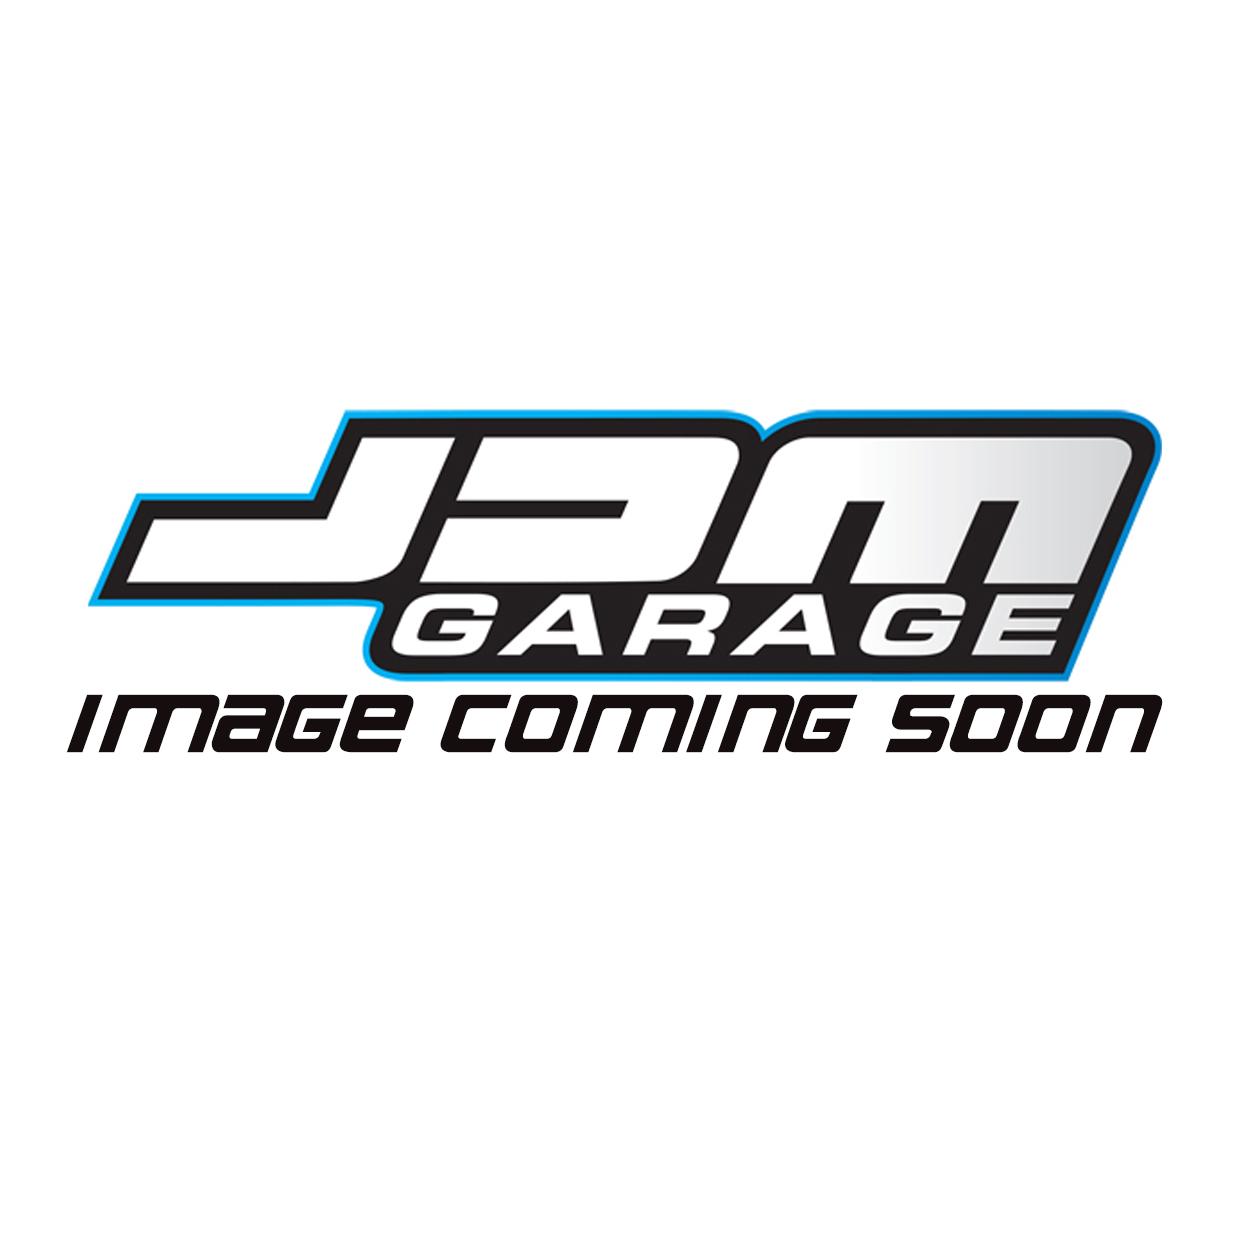 Genuine Nissan OEM Oil Filler Cap for Skyline R31 R32 R33 GTST R34 GTT GTR Silvia S13 S14 S15 FairladyZ 300ZX 350Z Stagea WC34 M35 Laurel Cedric Cefiro March Cube 15255-1P103